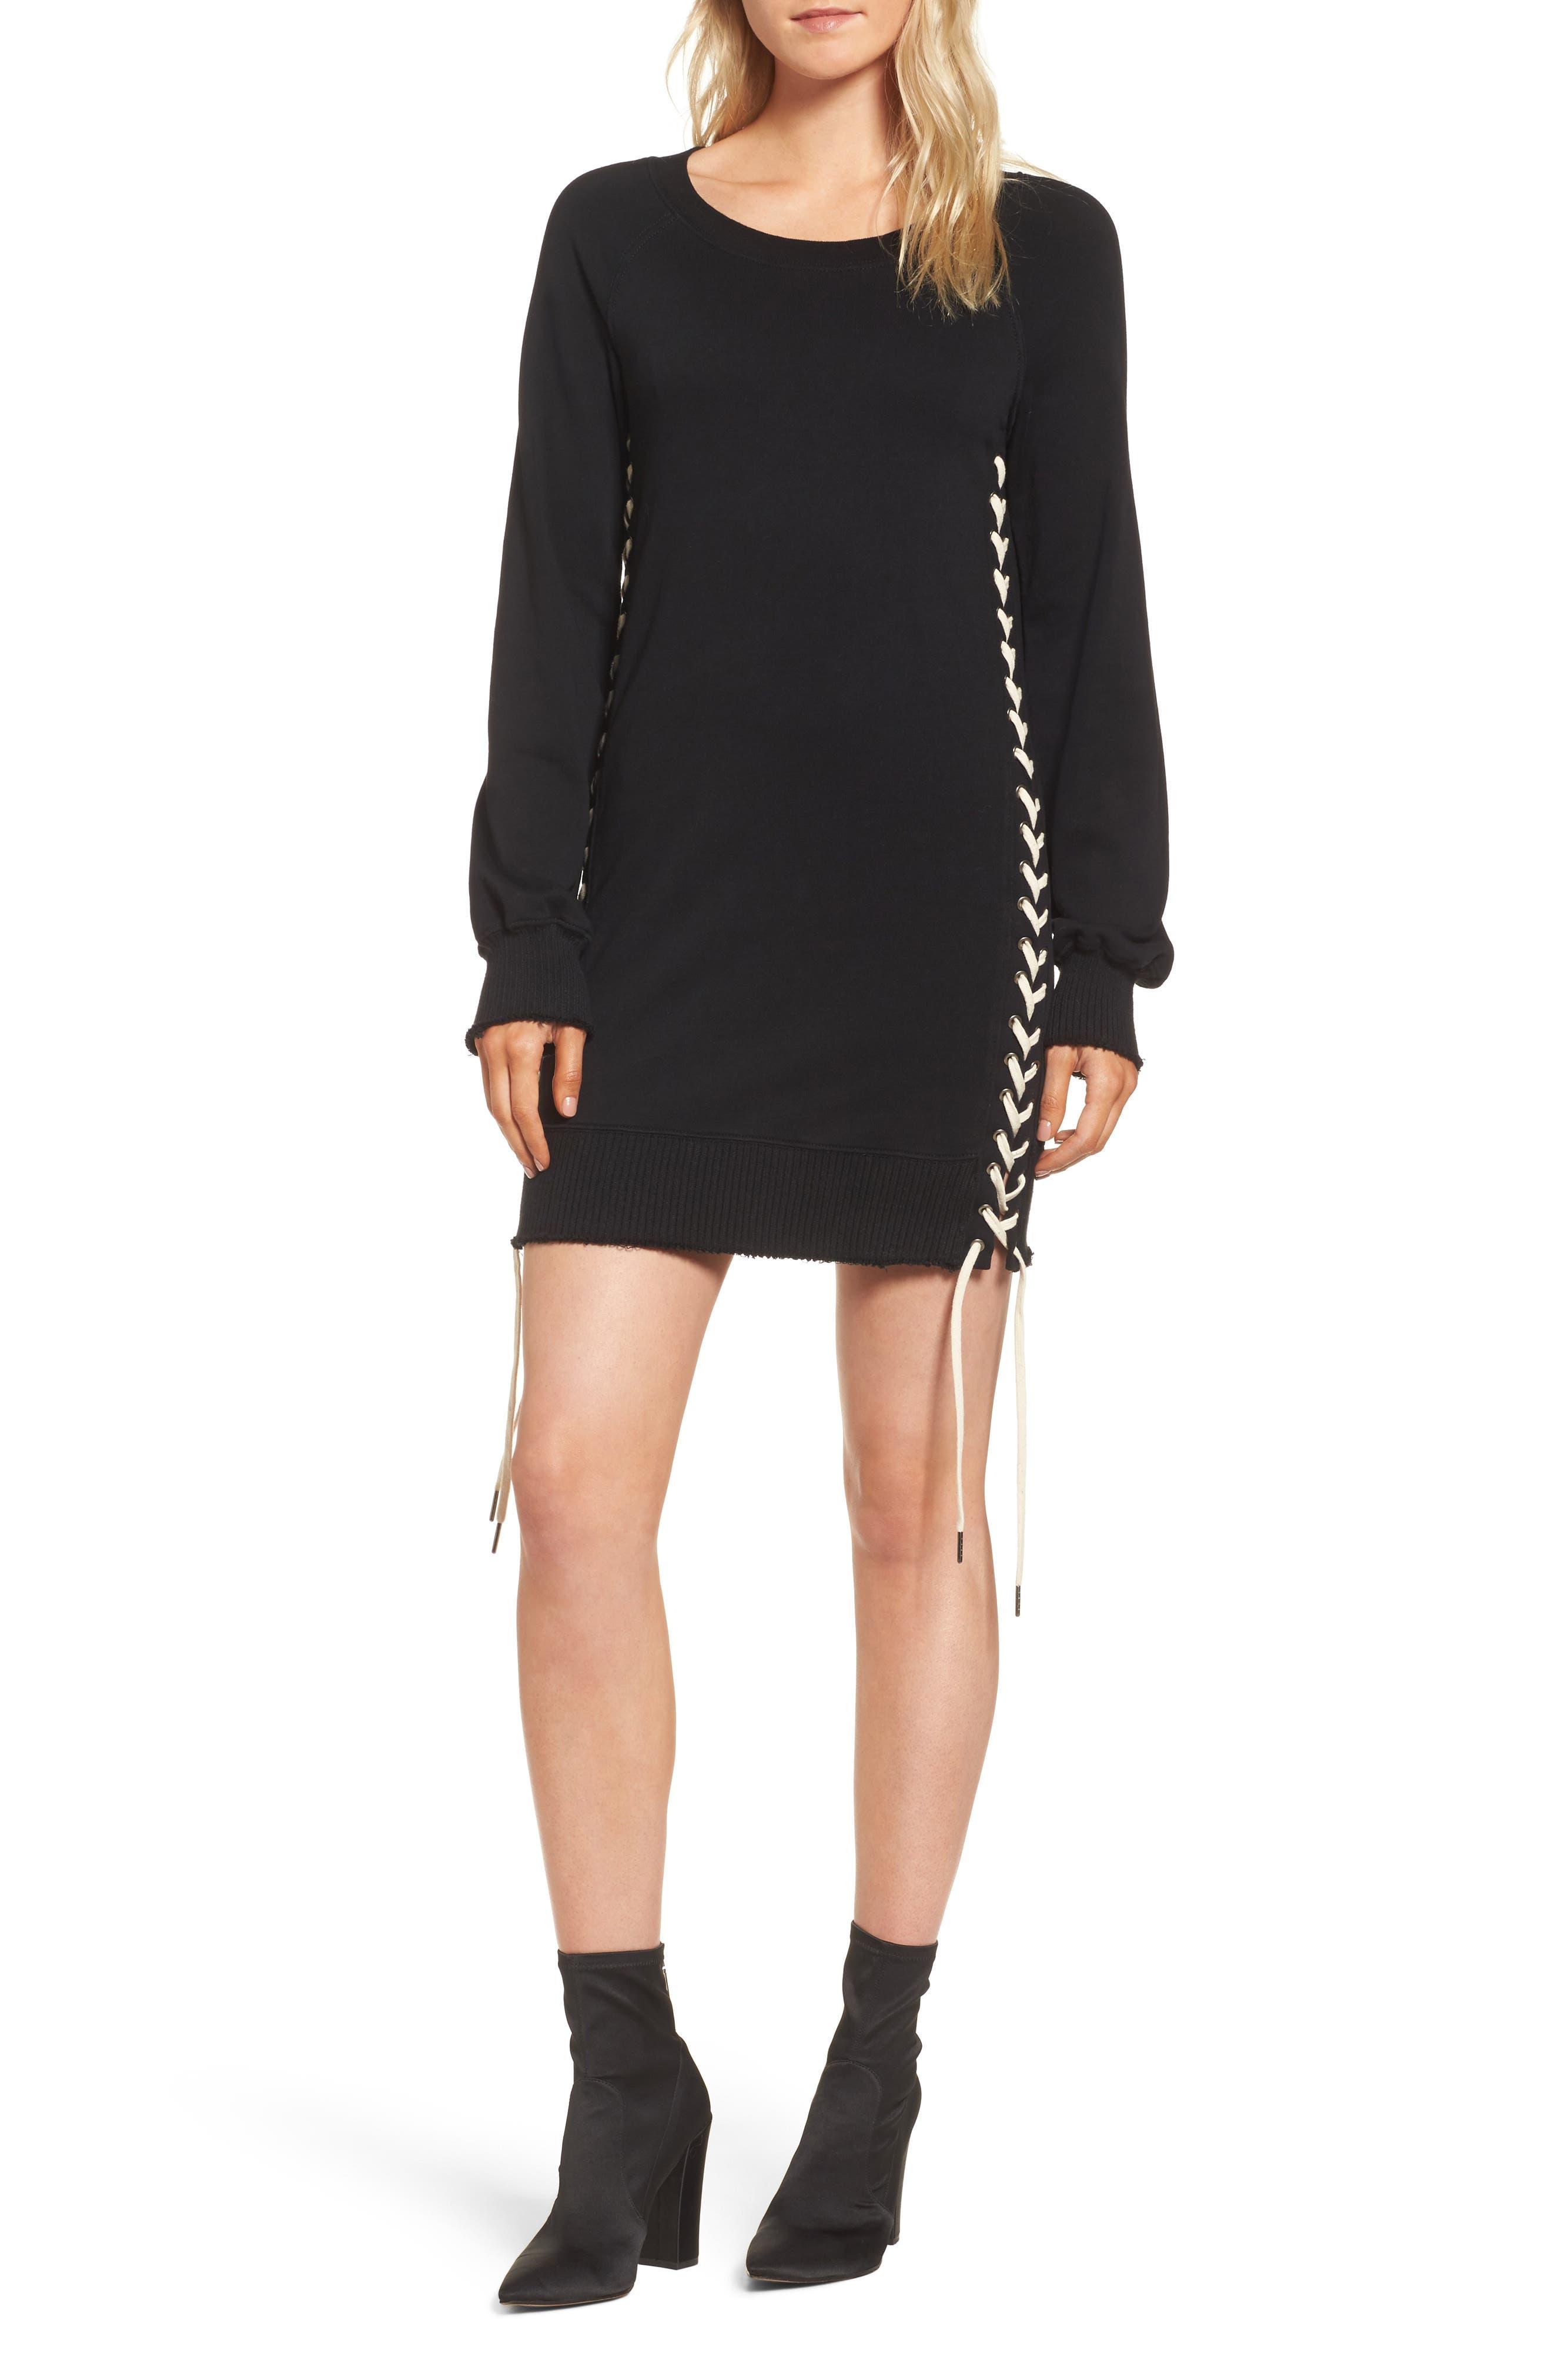 Main Image - Pam & Gela Lace-Up Sweatshirt Dress